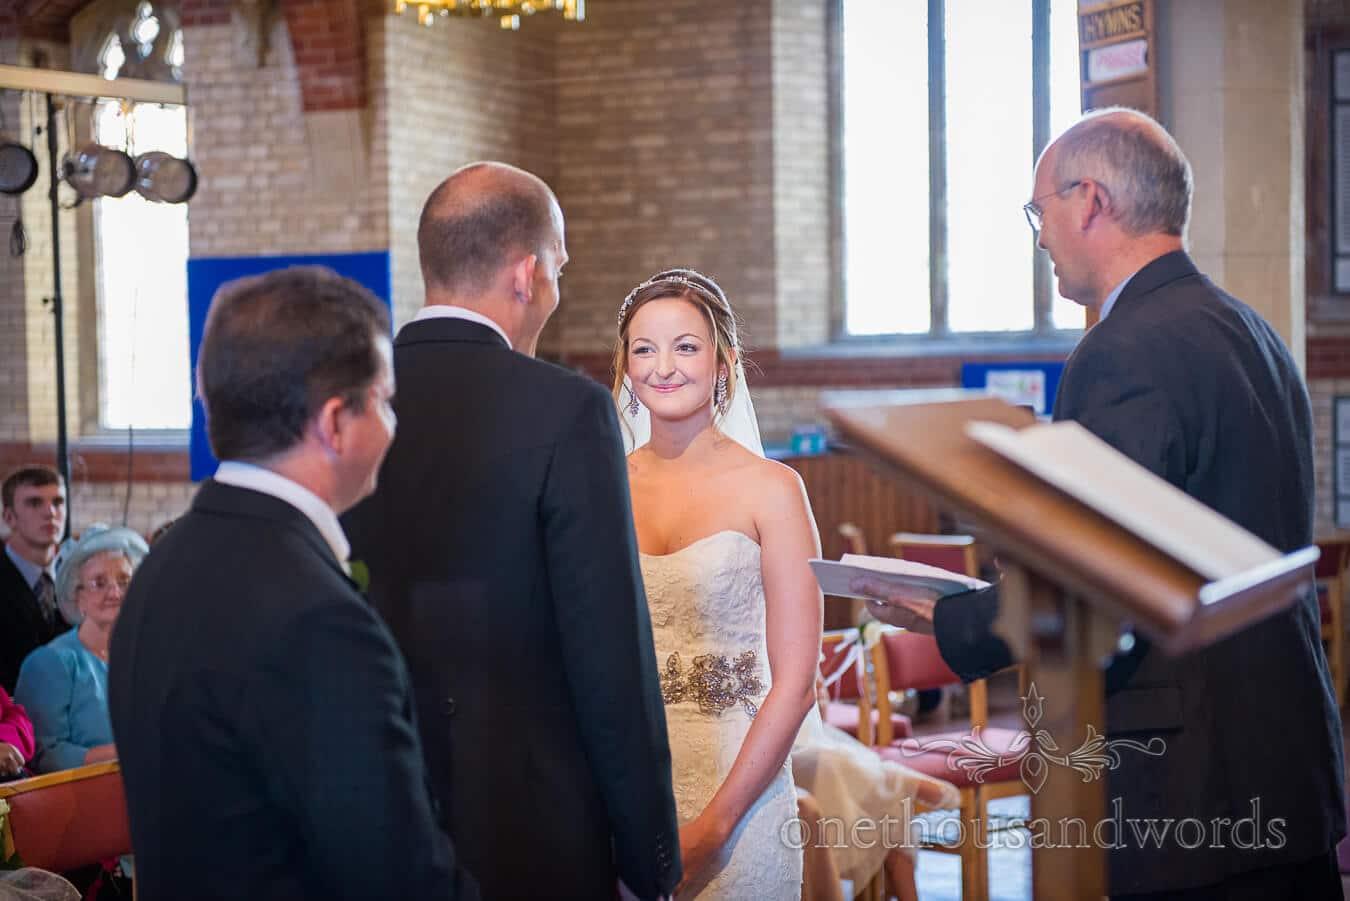 Bride smiling in church at Poole wedding venue ceremony